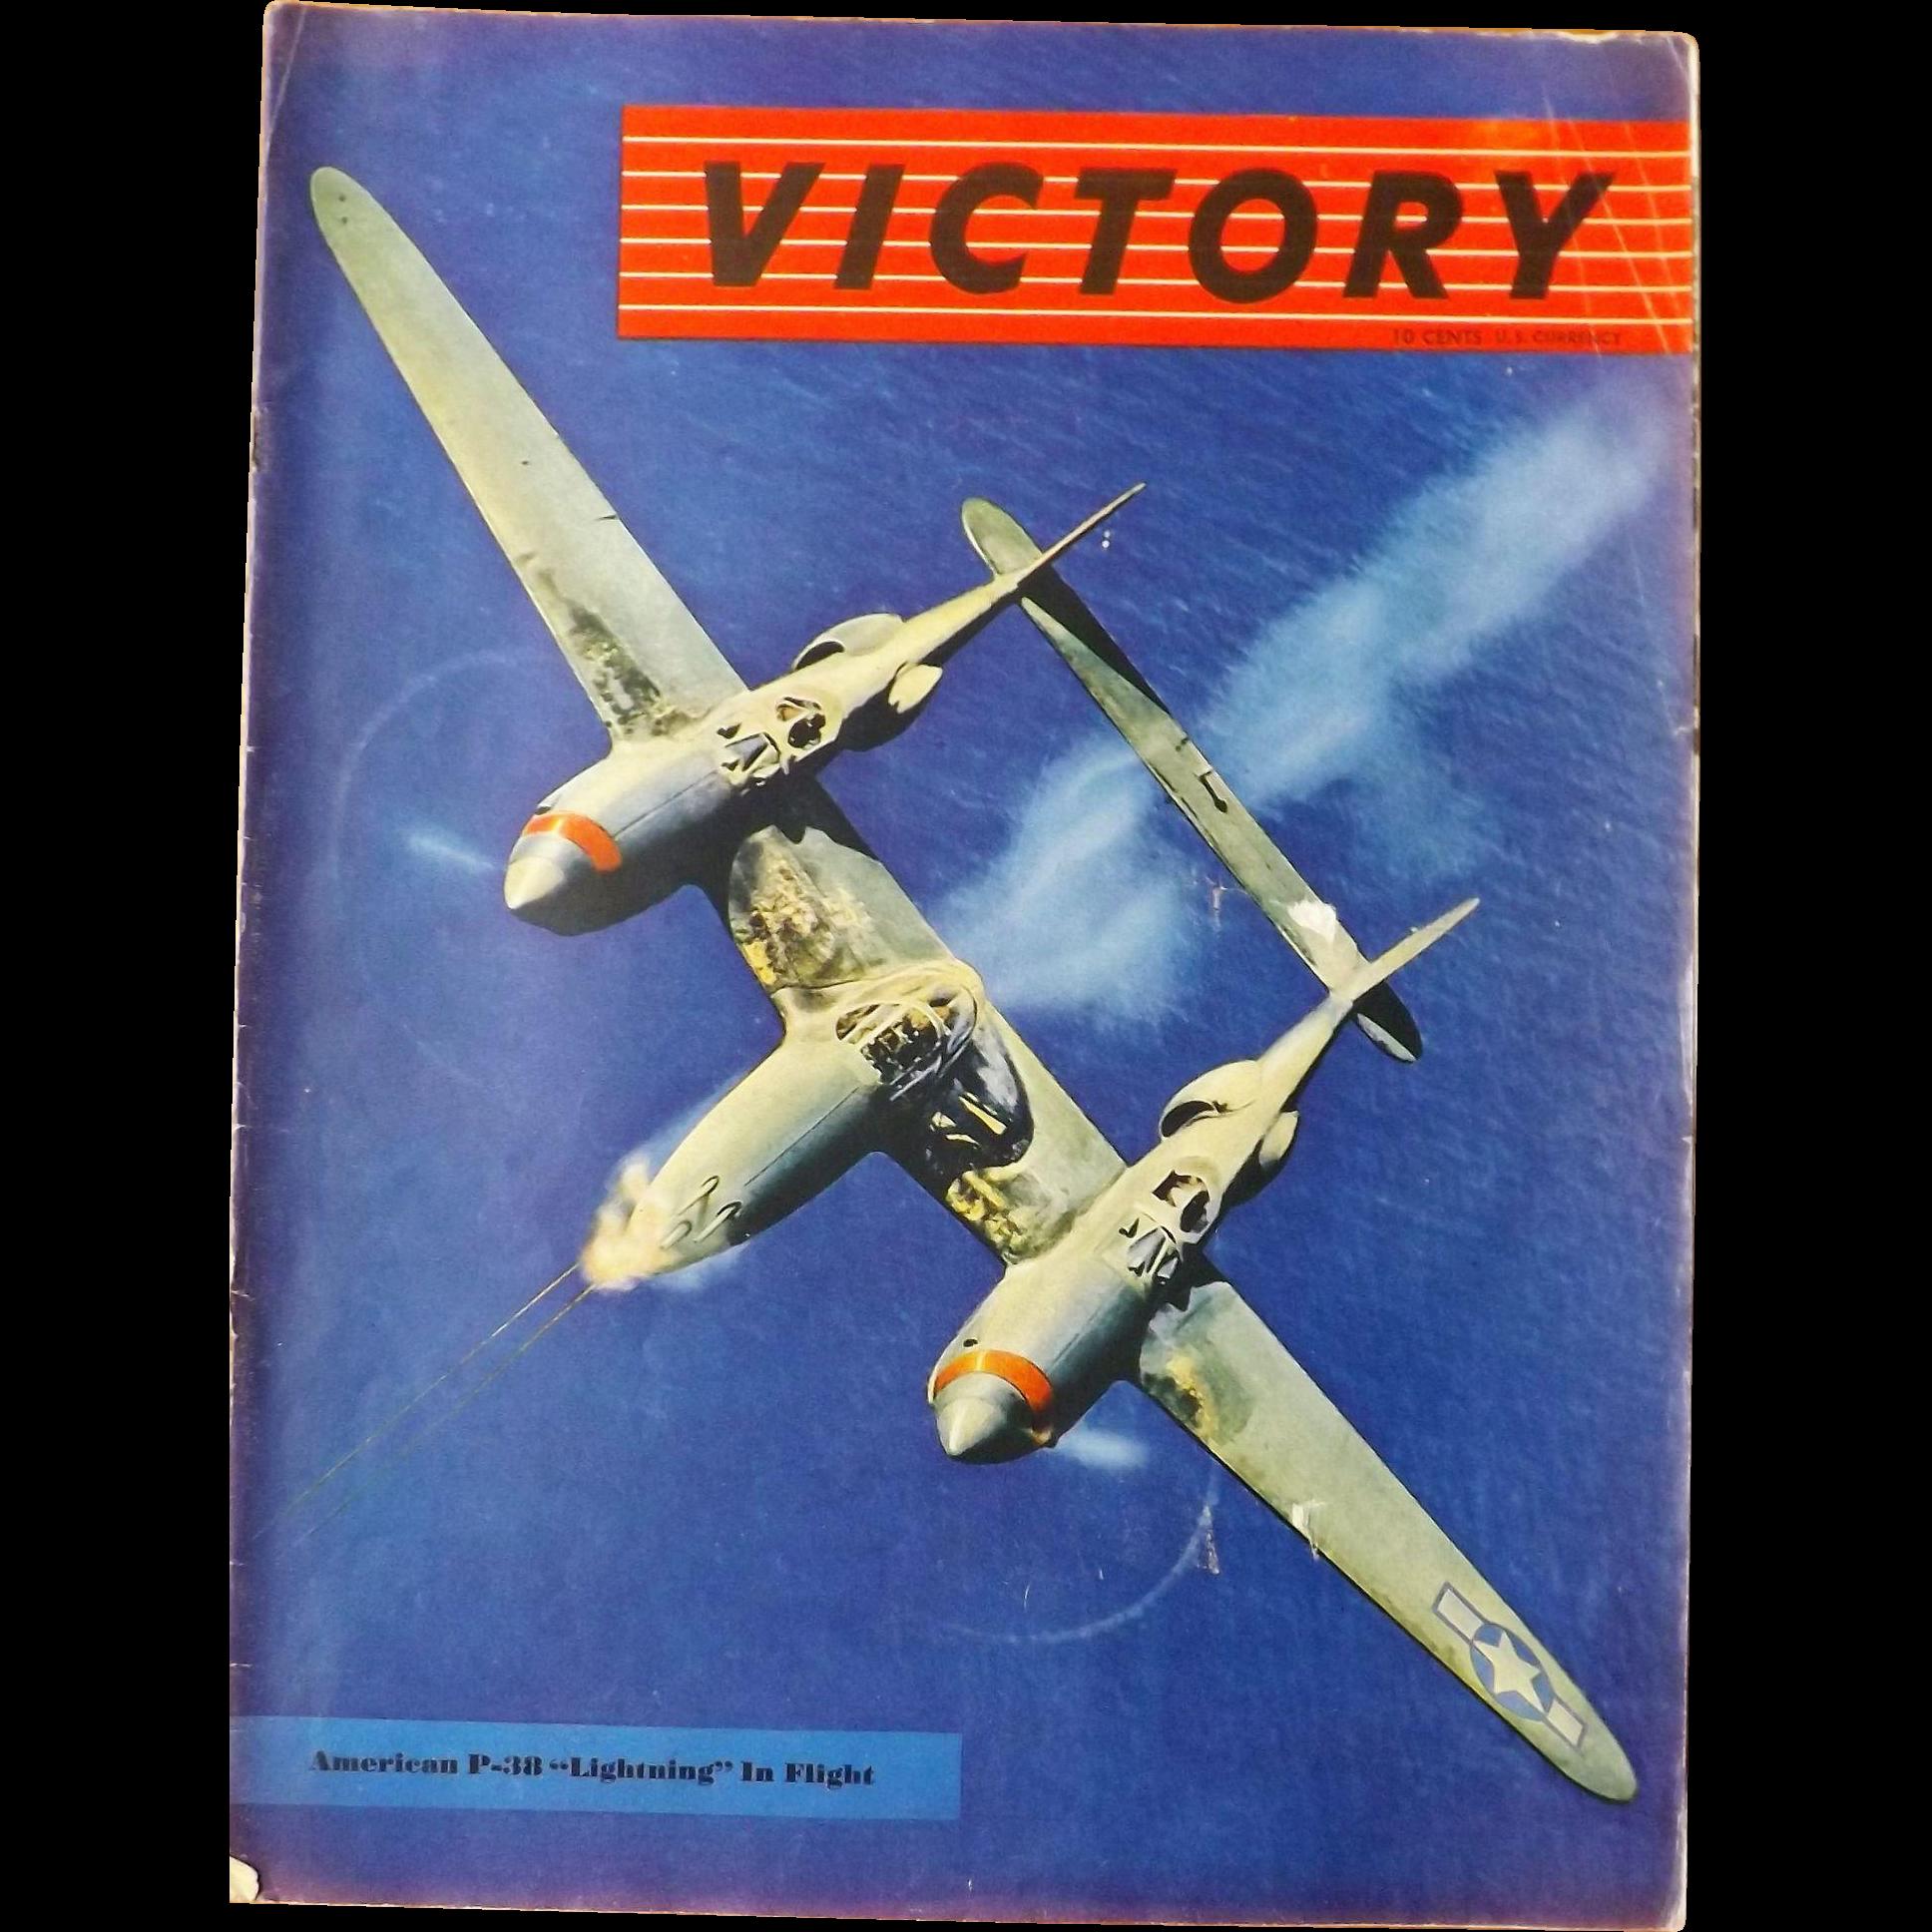 VICTORY Magazine Vol. 1 No. 4 - 1943 from molotov on Ruby Lane